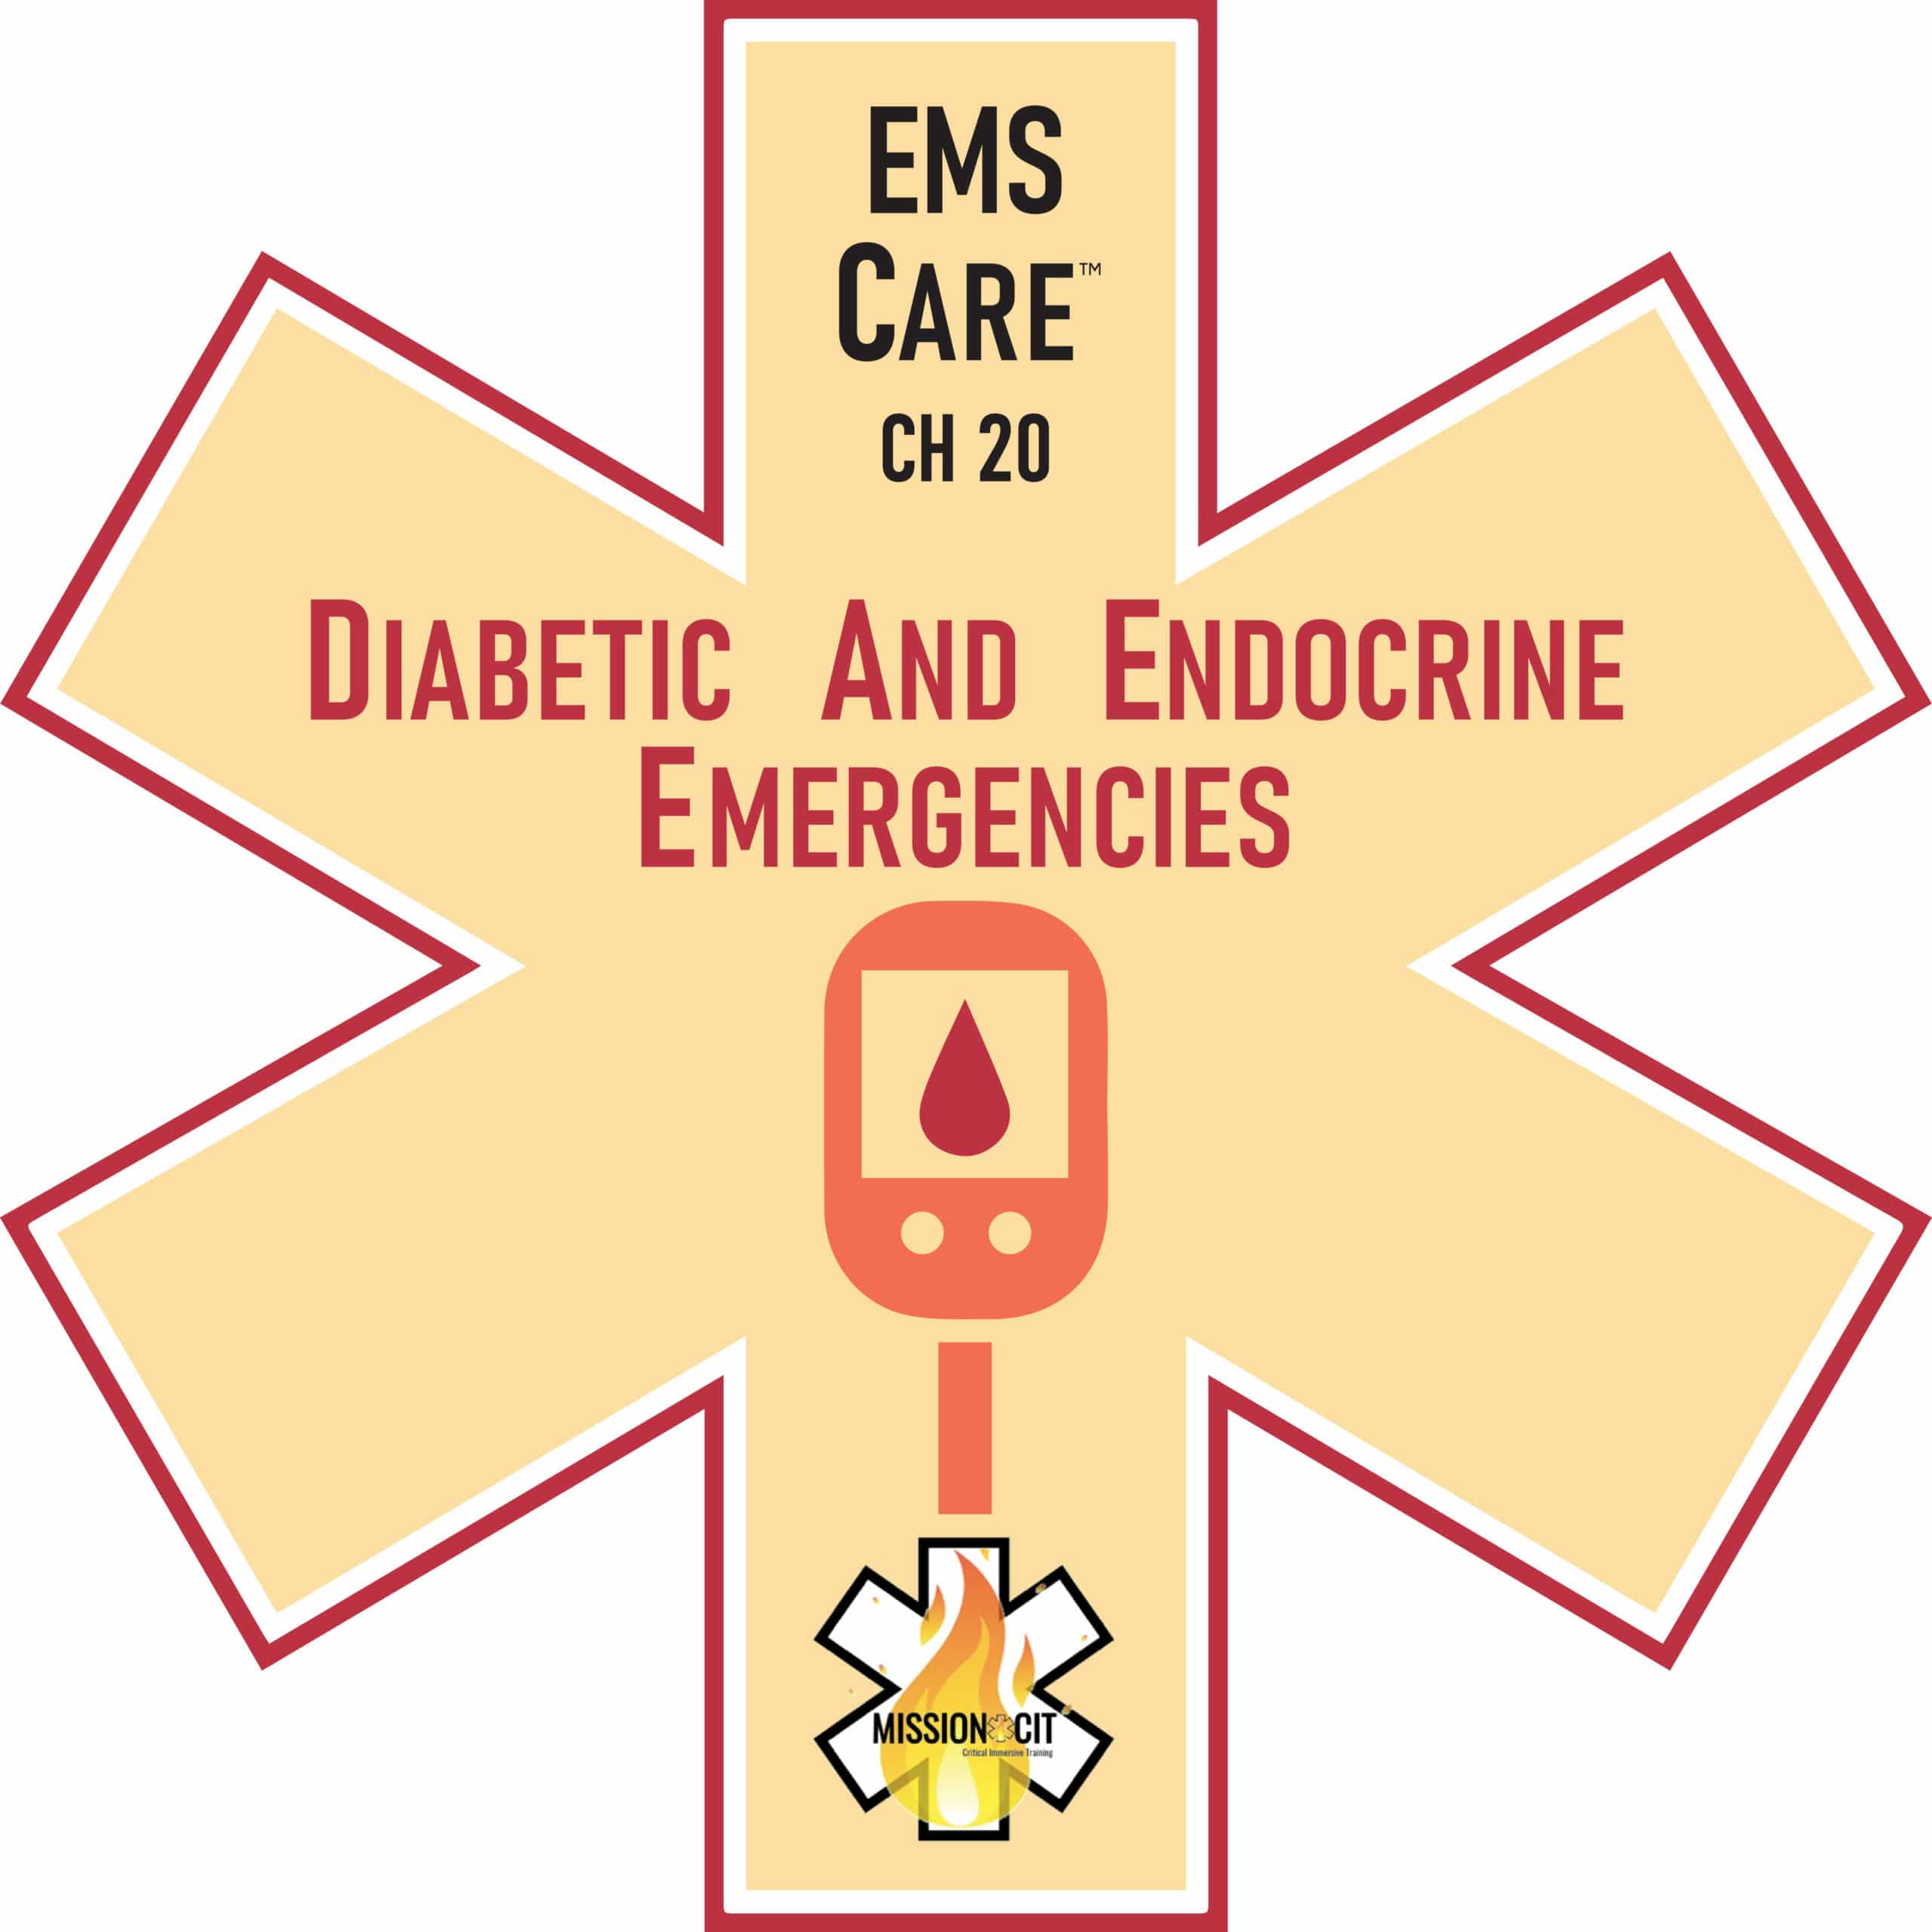 missioncit-ems-care-diabetic-and-endocrine-emergencies